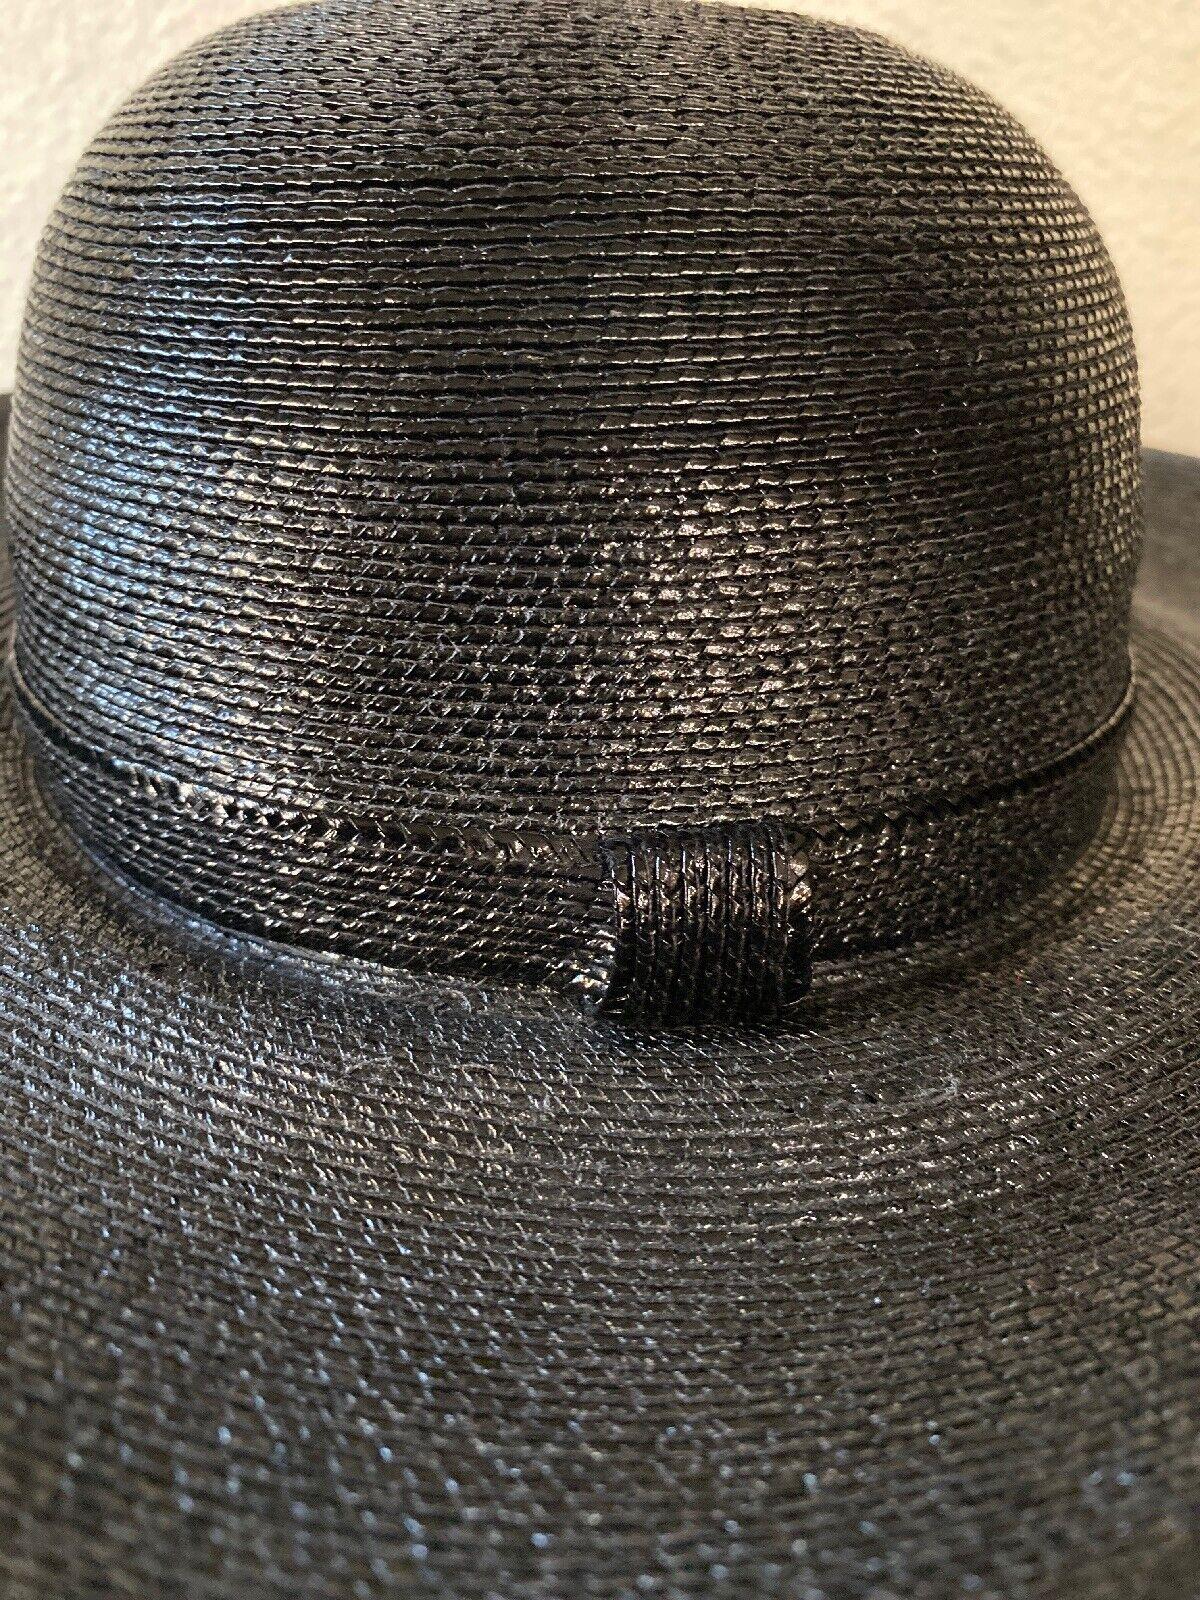 Vintage Amen Wardy Large Hat ! 1980's Large Brim … - image 10